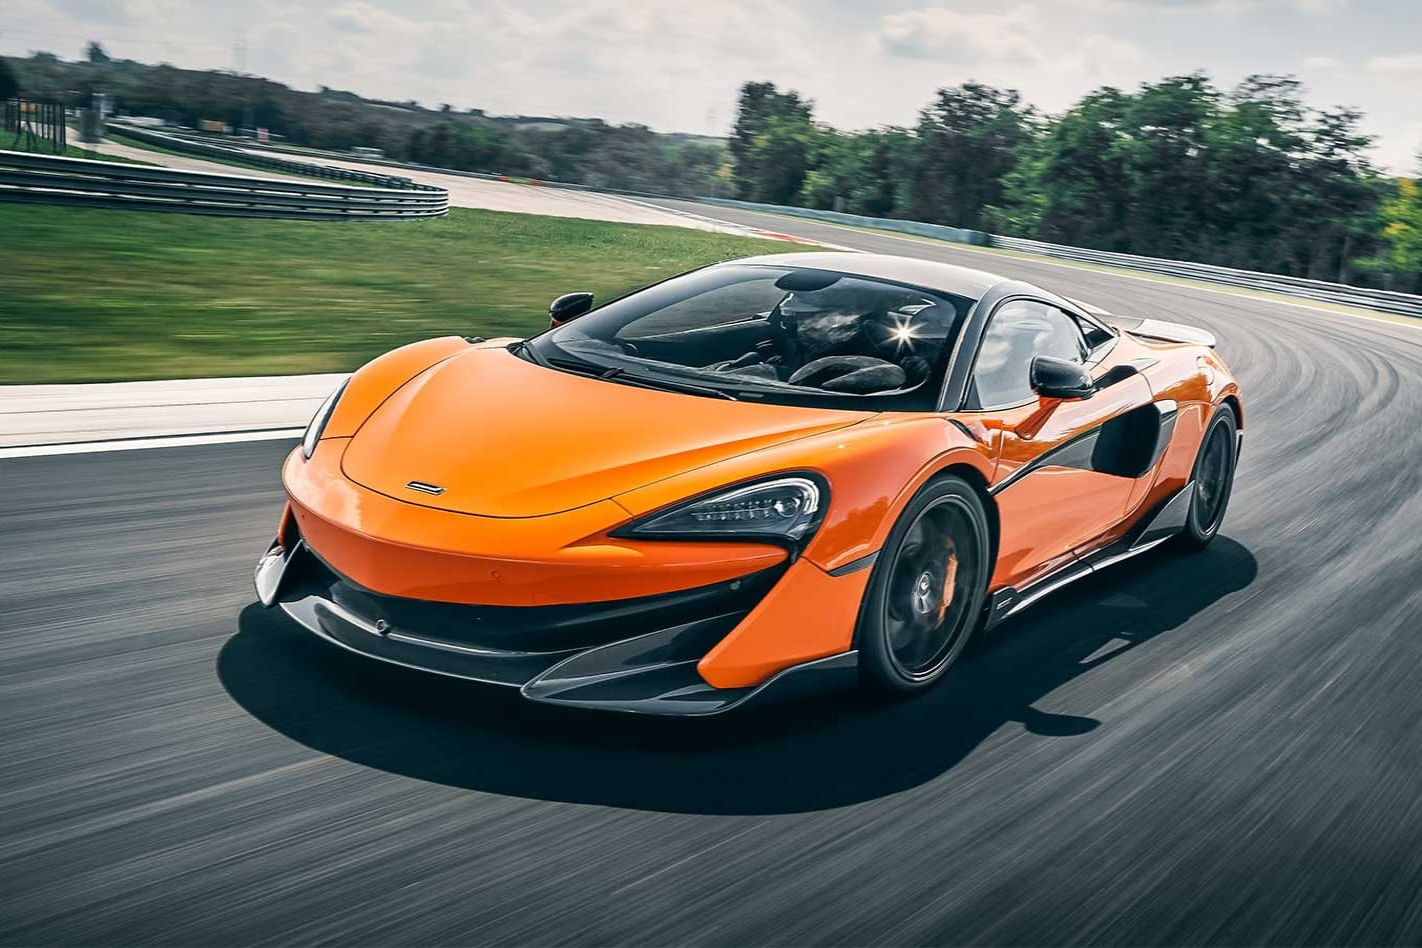 2018 McLaren 600LT performance review